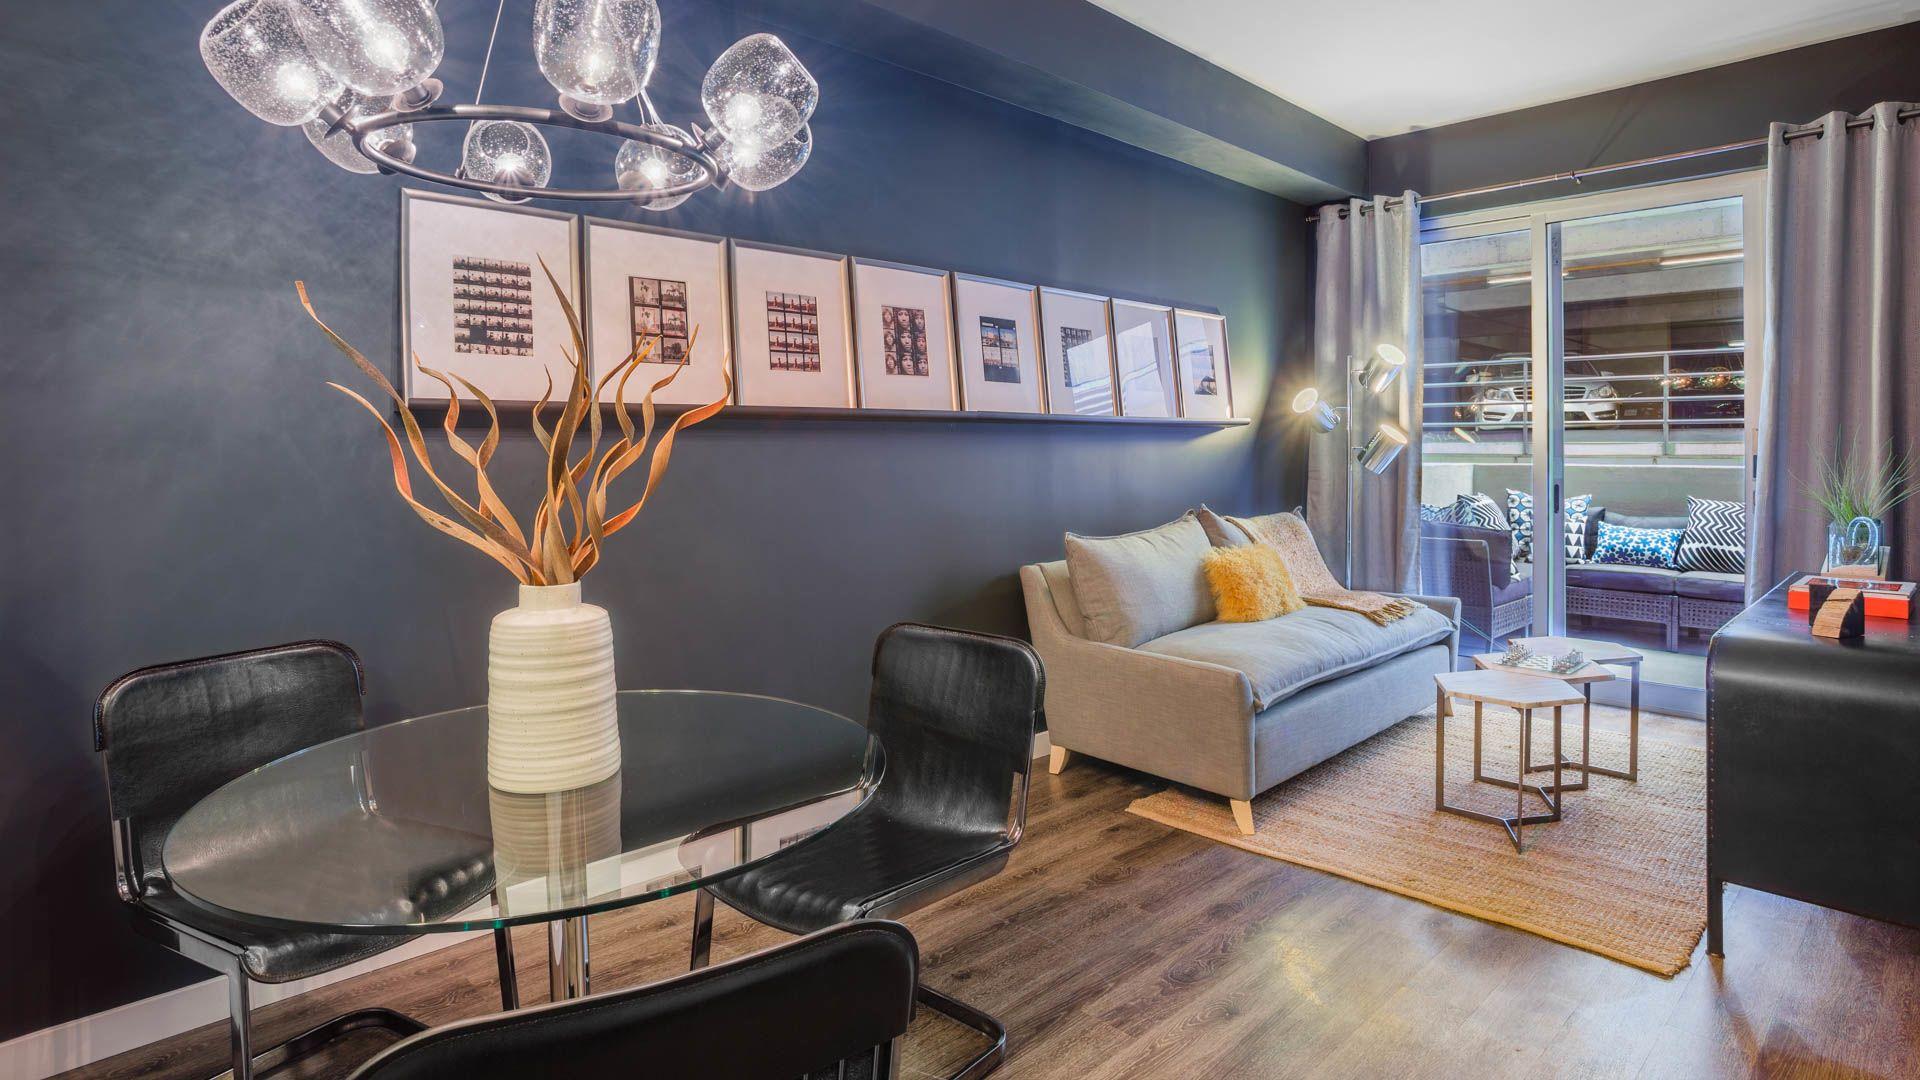 Radius Koreatown Apartments - Living Area